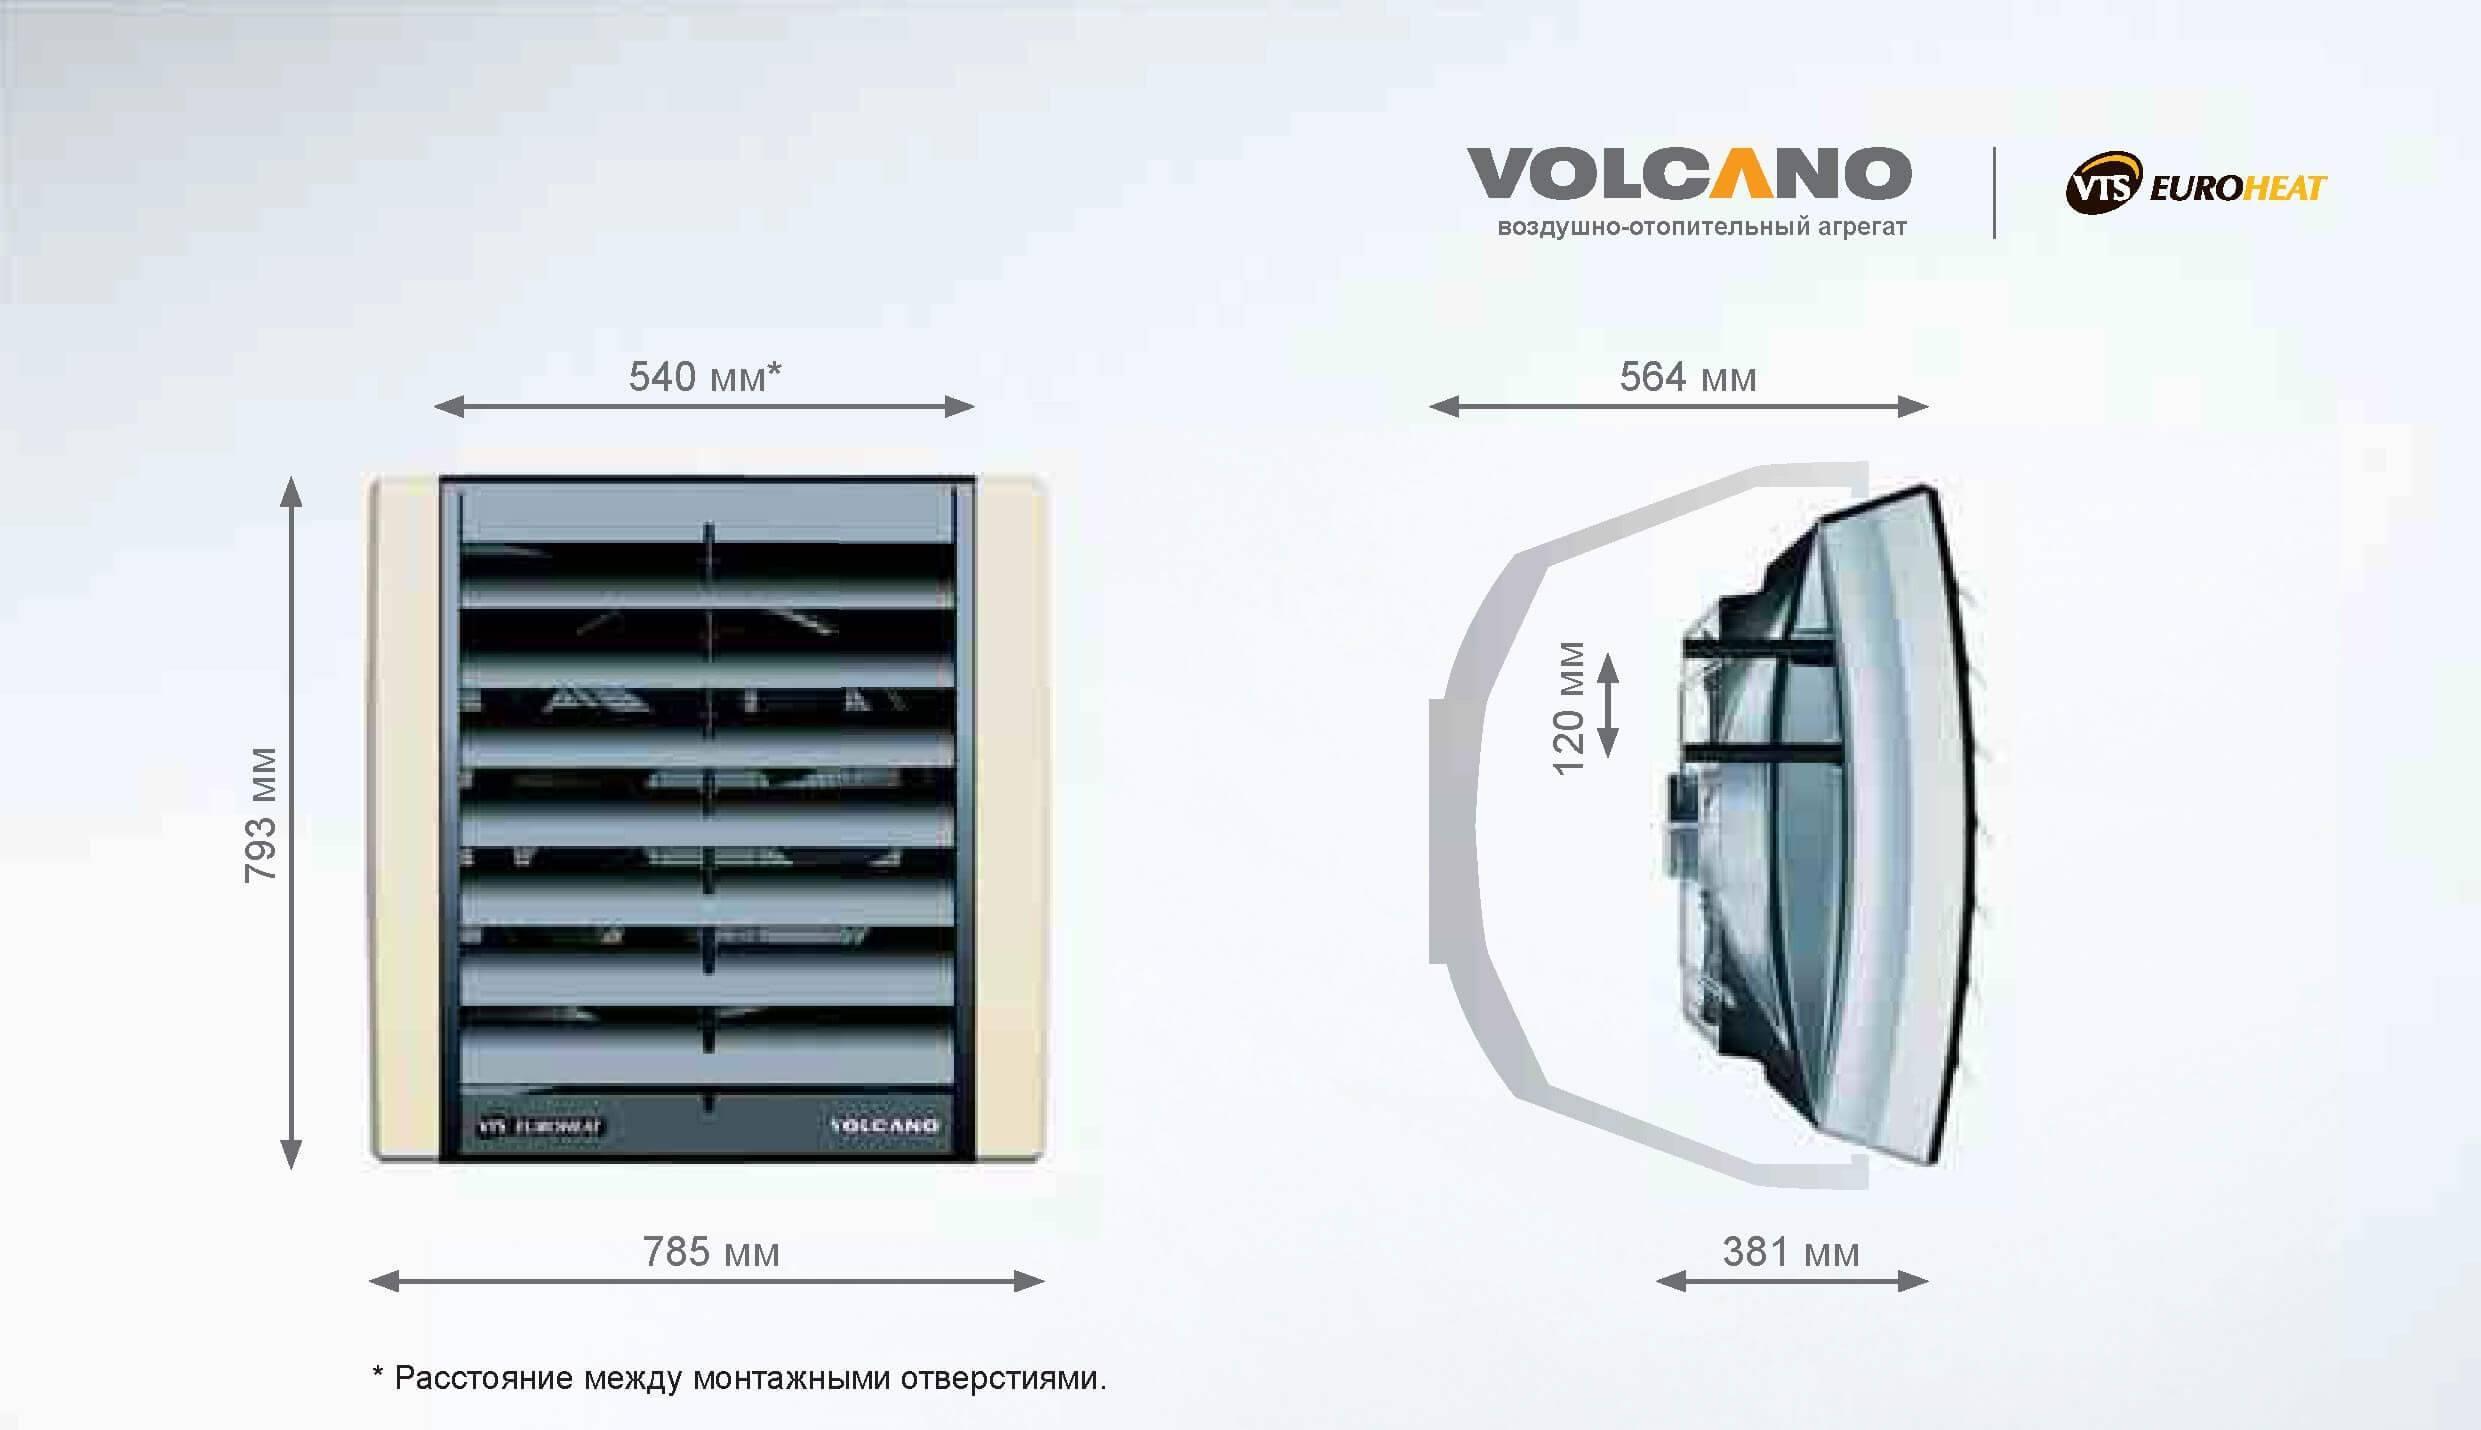 Volcano 1 ec - 1-4-0101-0442 - vts group